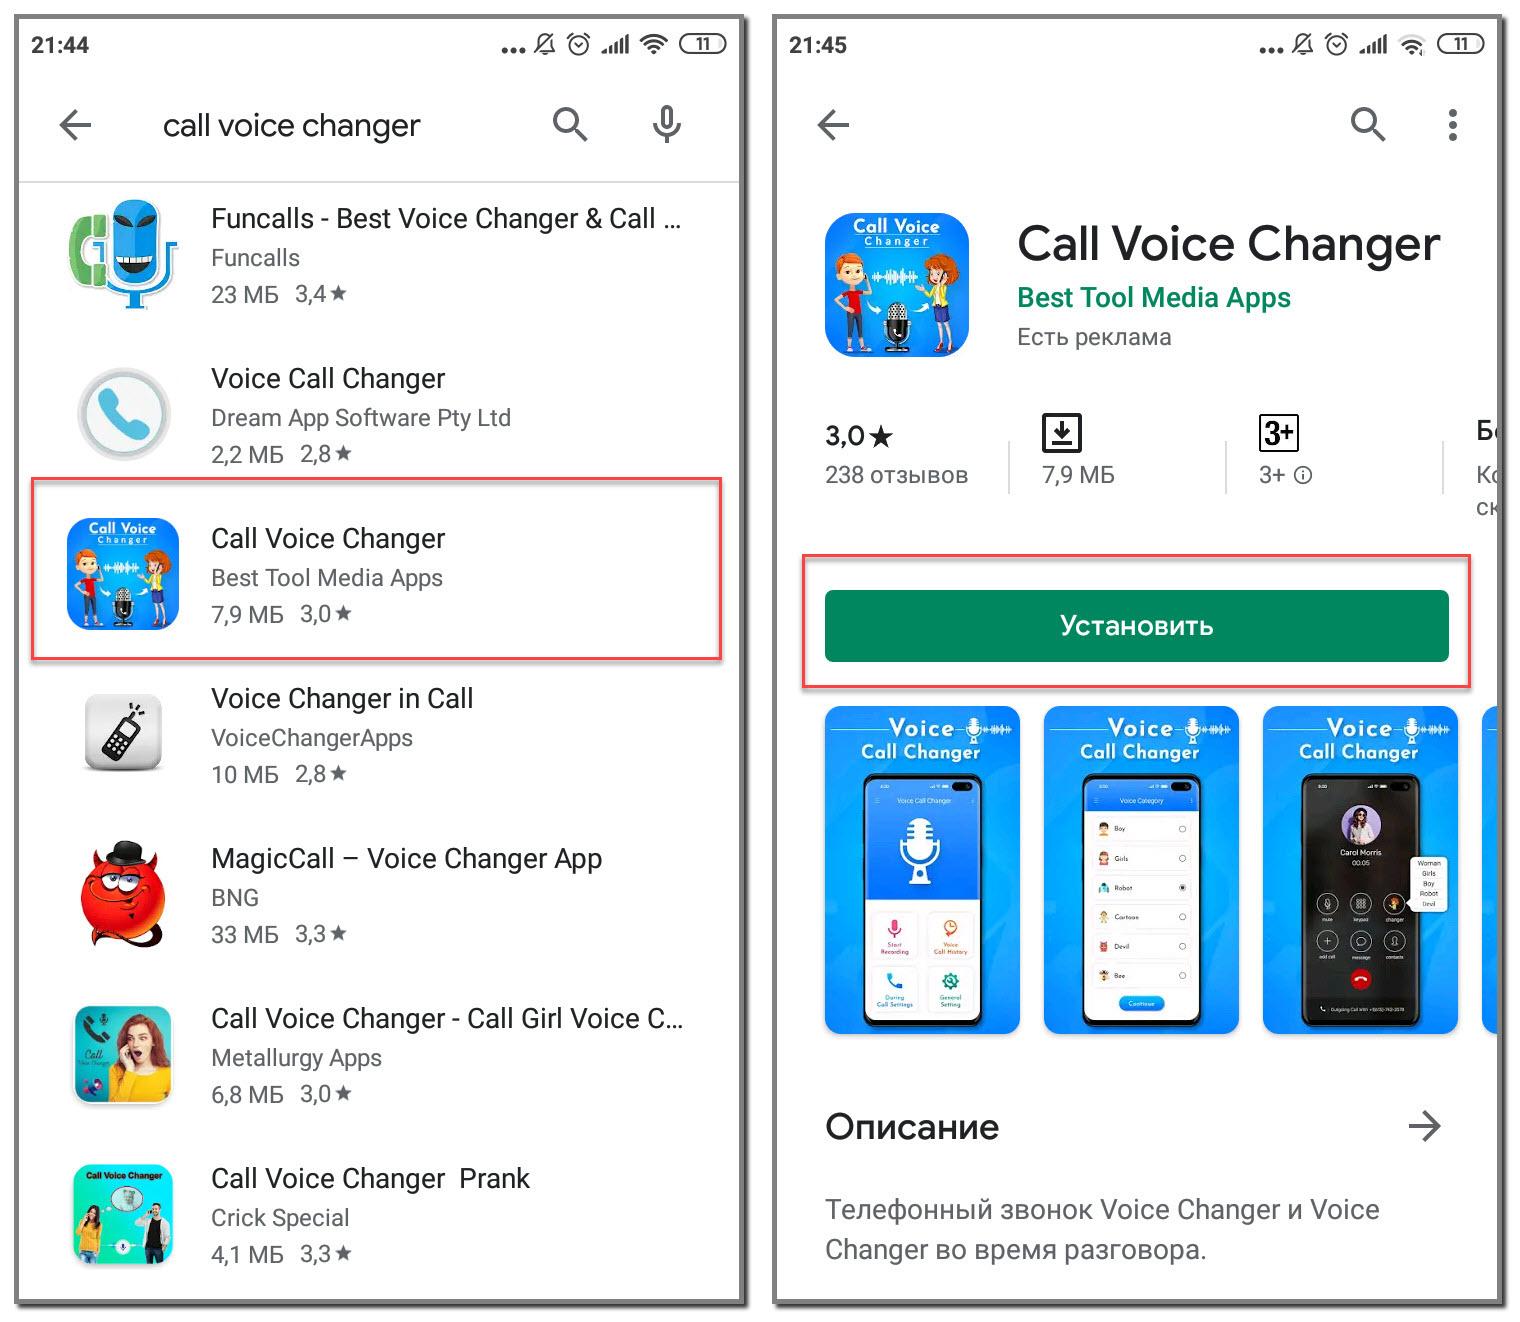 Устанавливаем приложение Call Voice Changer